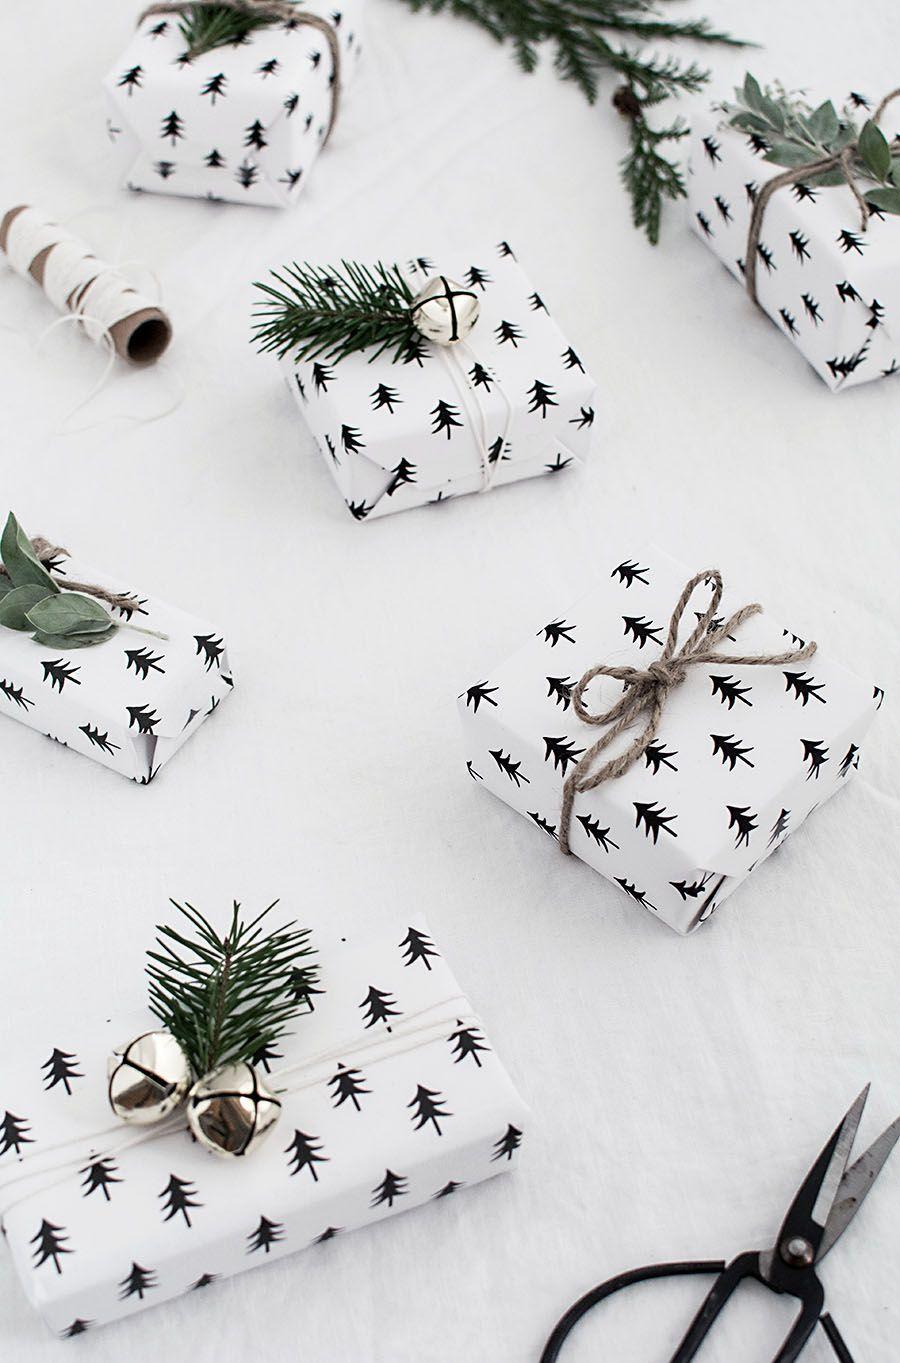 DIY Scandinavian Christmas Wrapping Paper via homeyohmy - DIY Scandinavian Christmas Decorations